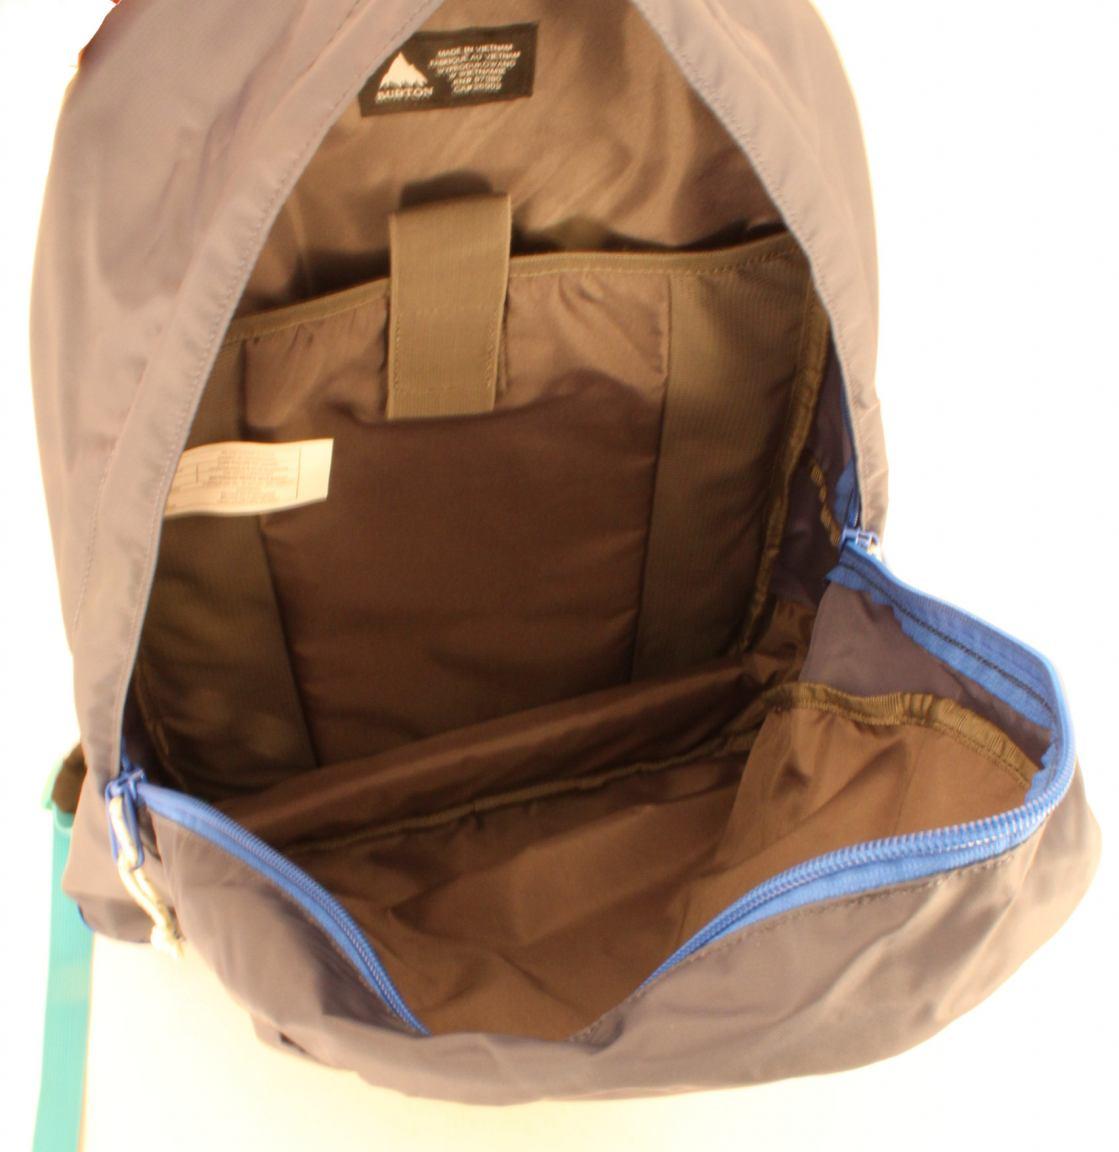 067ecb37eb7b3 Burton Kettle Daypack sinola print - Bags   more